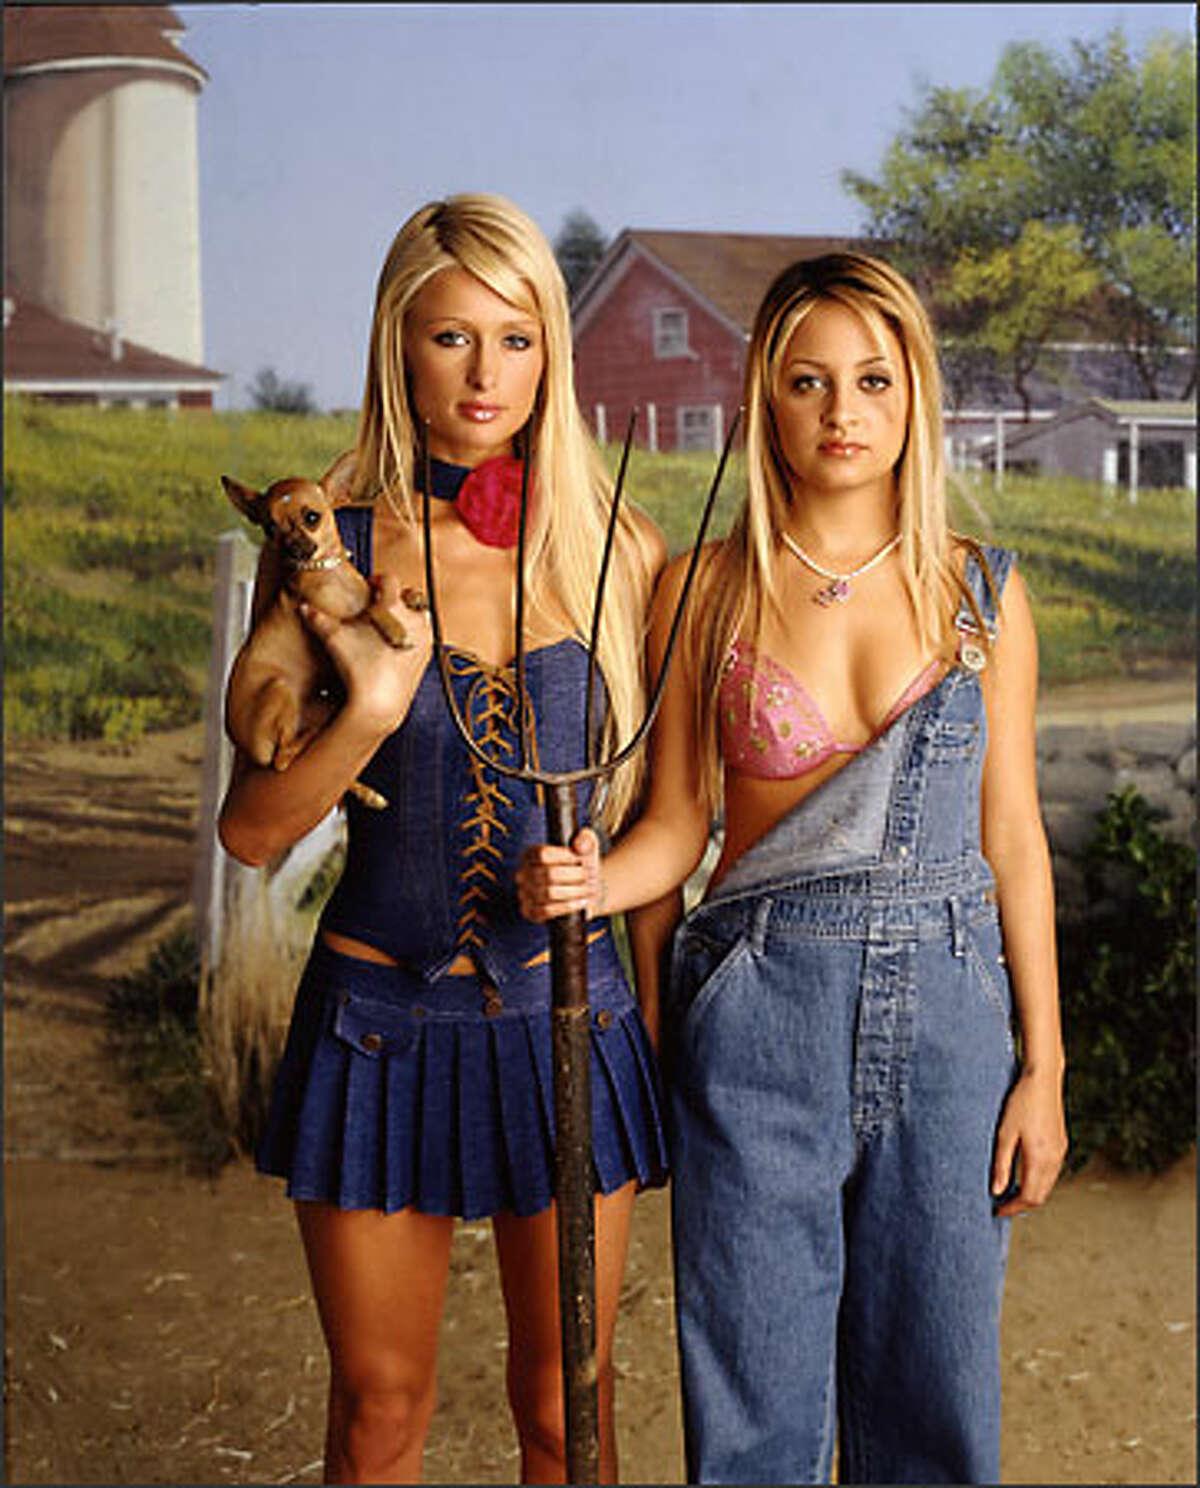 Society princesses Paris Hilton, left, and Nicole Richie brave life on the farm in